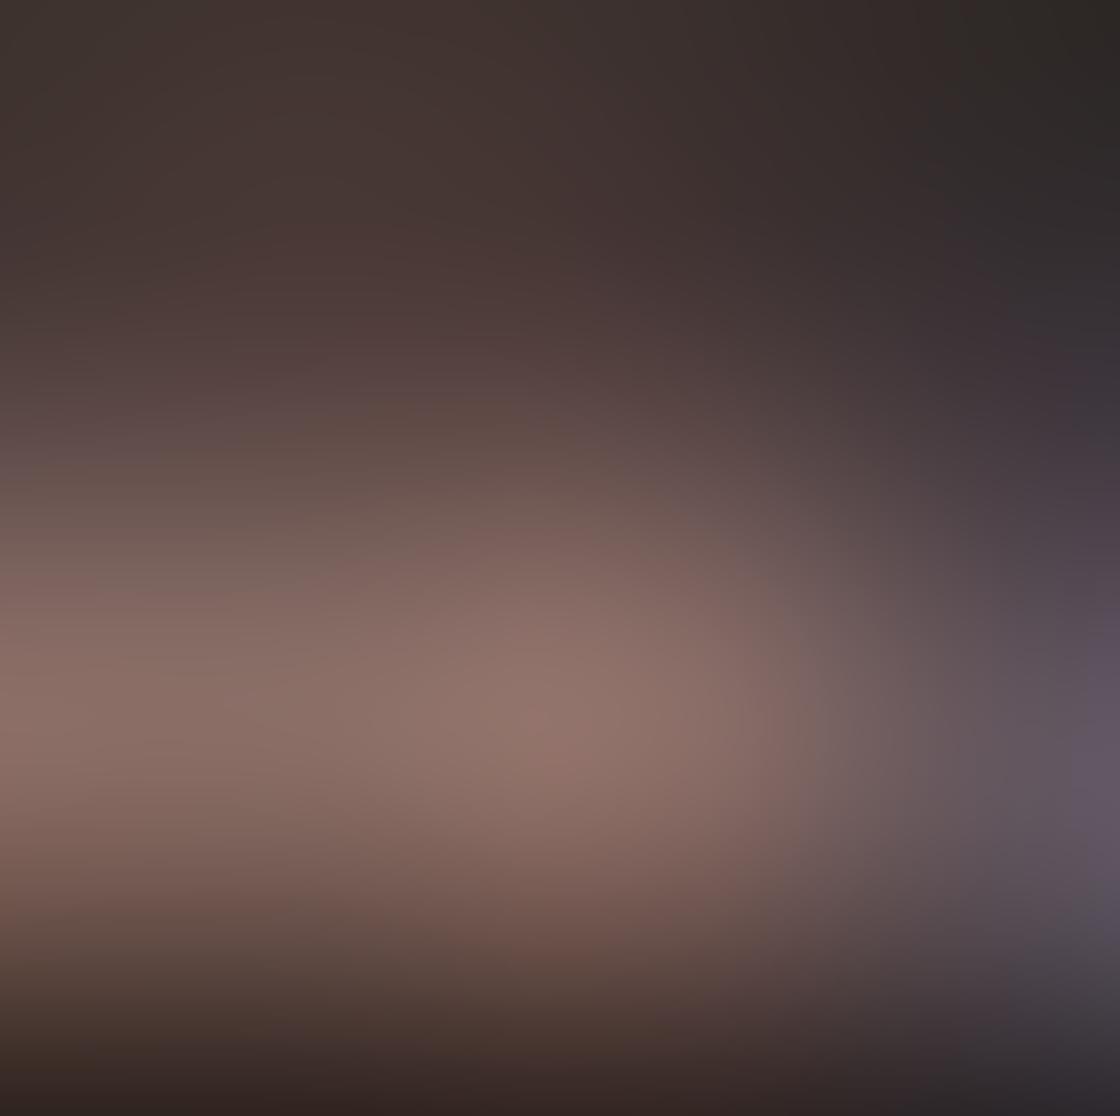 iPhone Photo Perspective 24